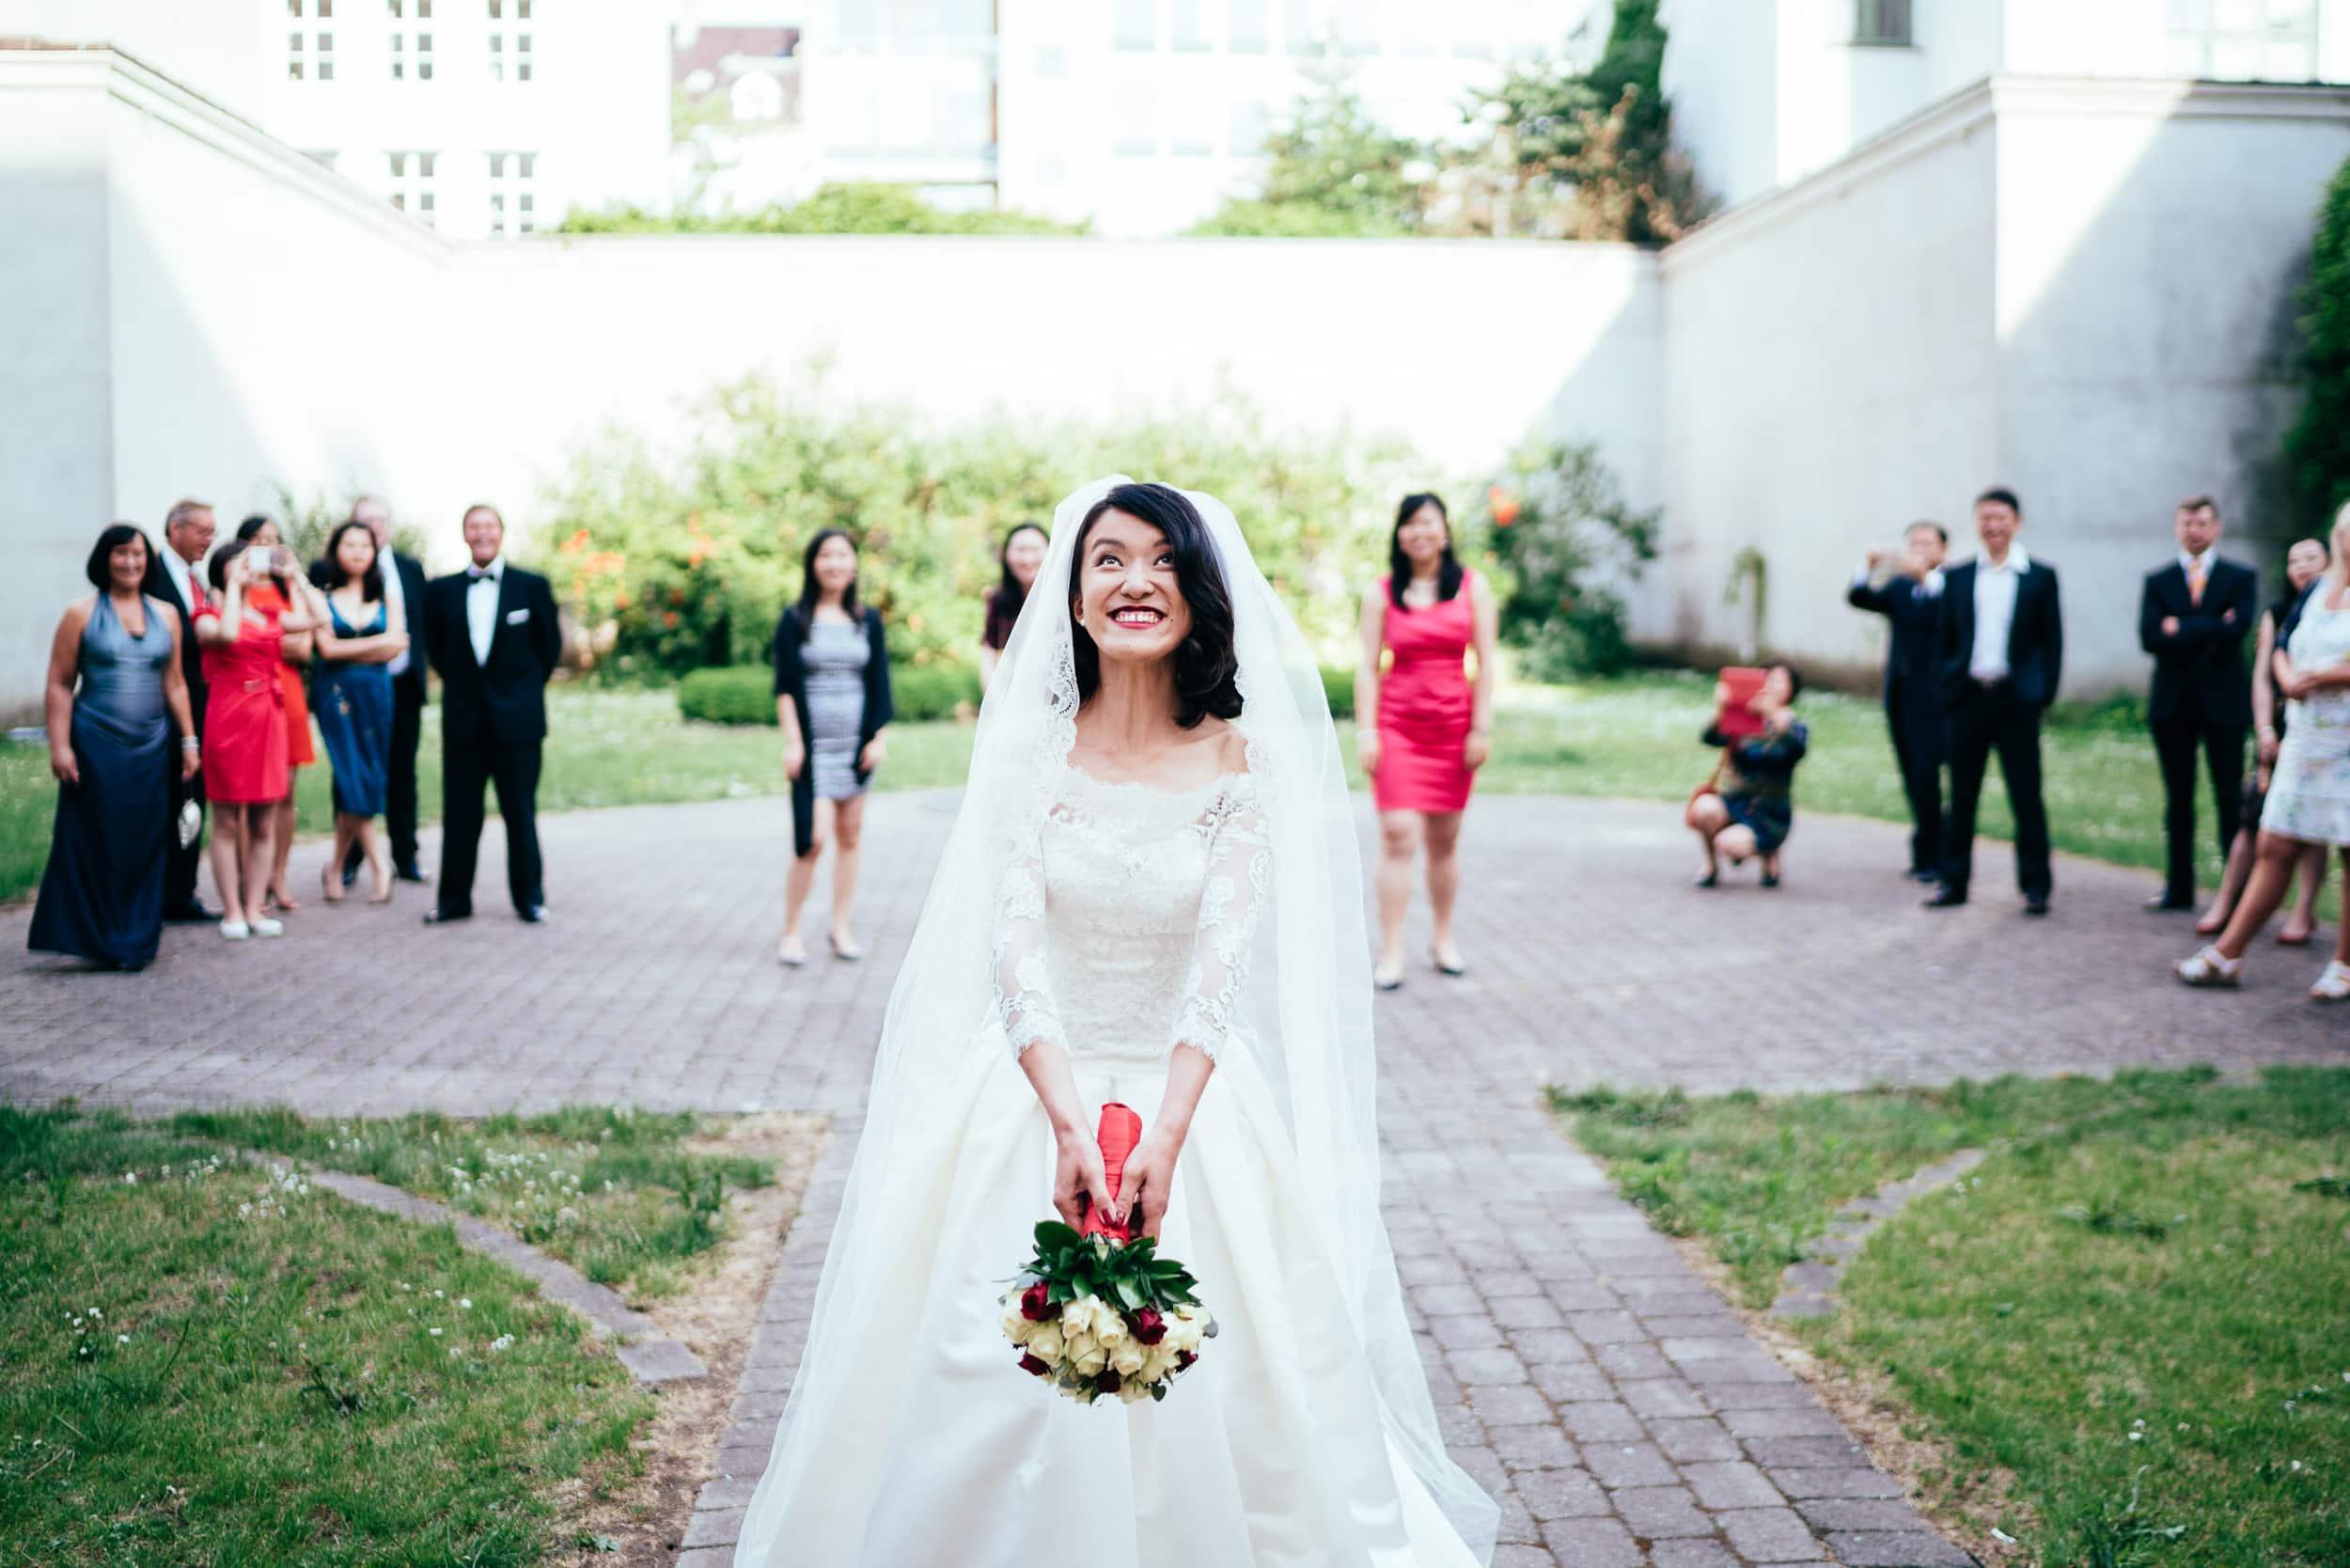 brud-der-kaster-buket-bryllup.jpg